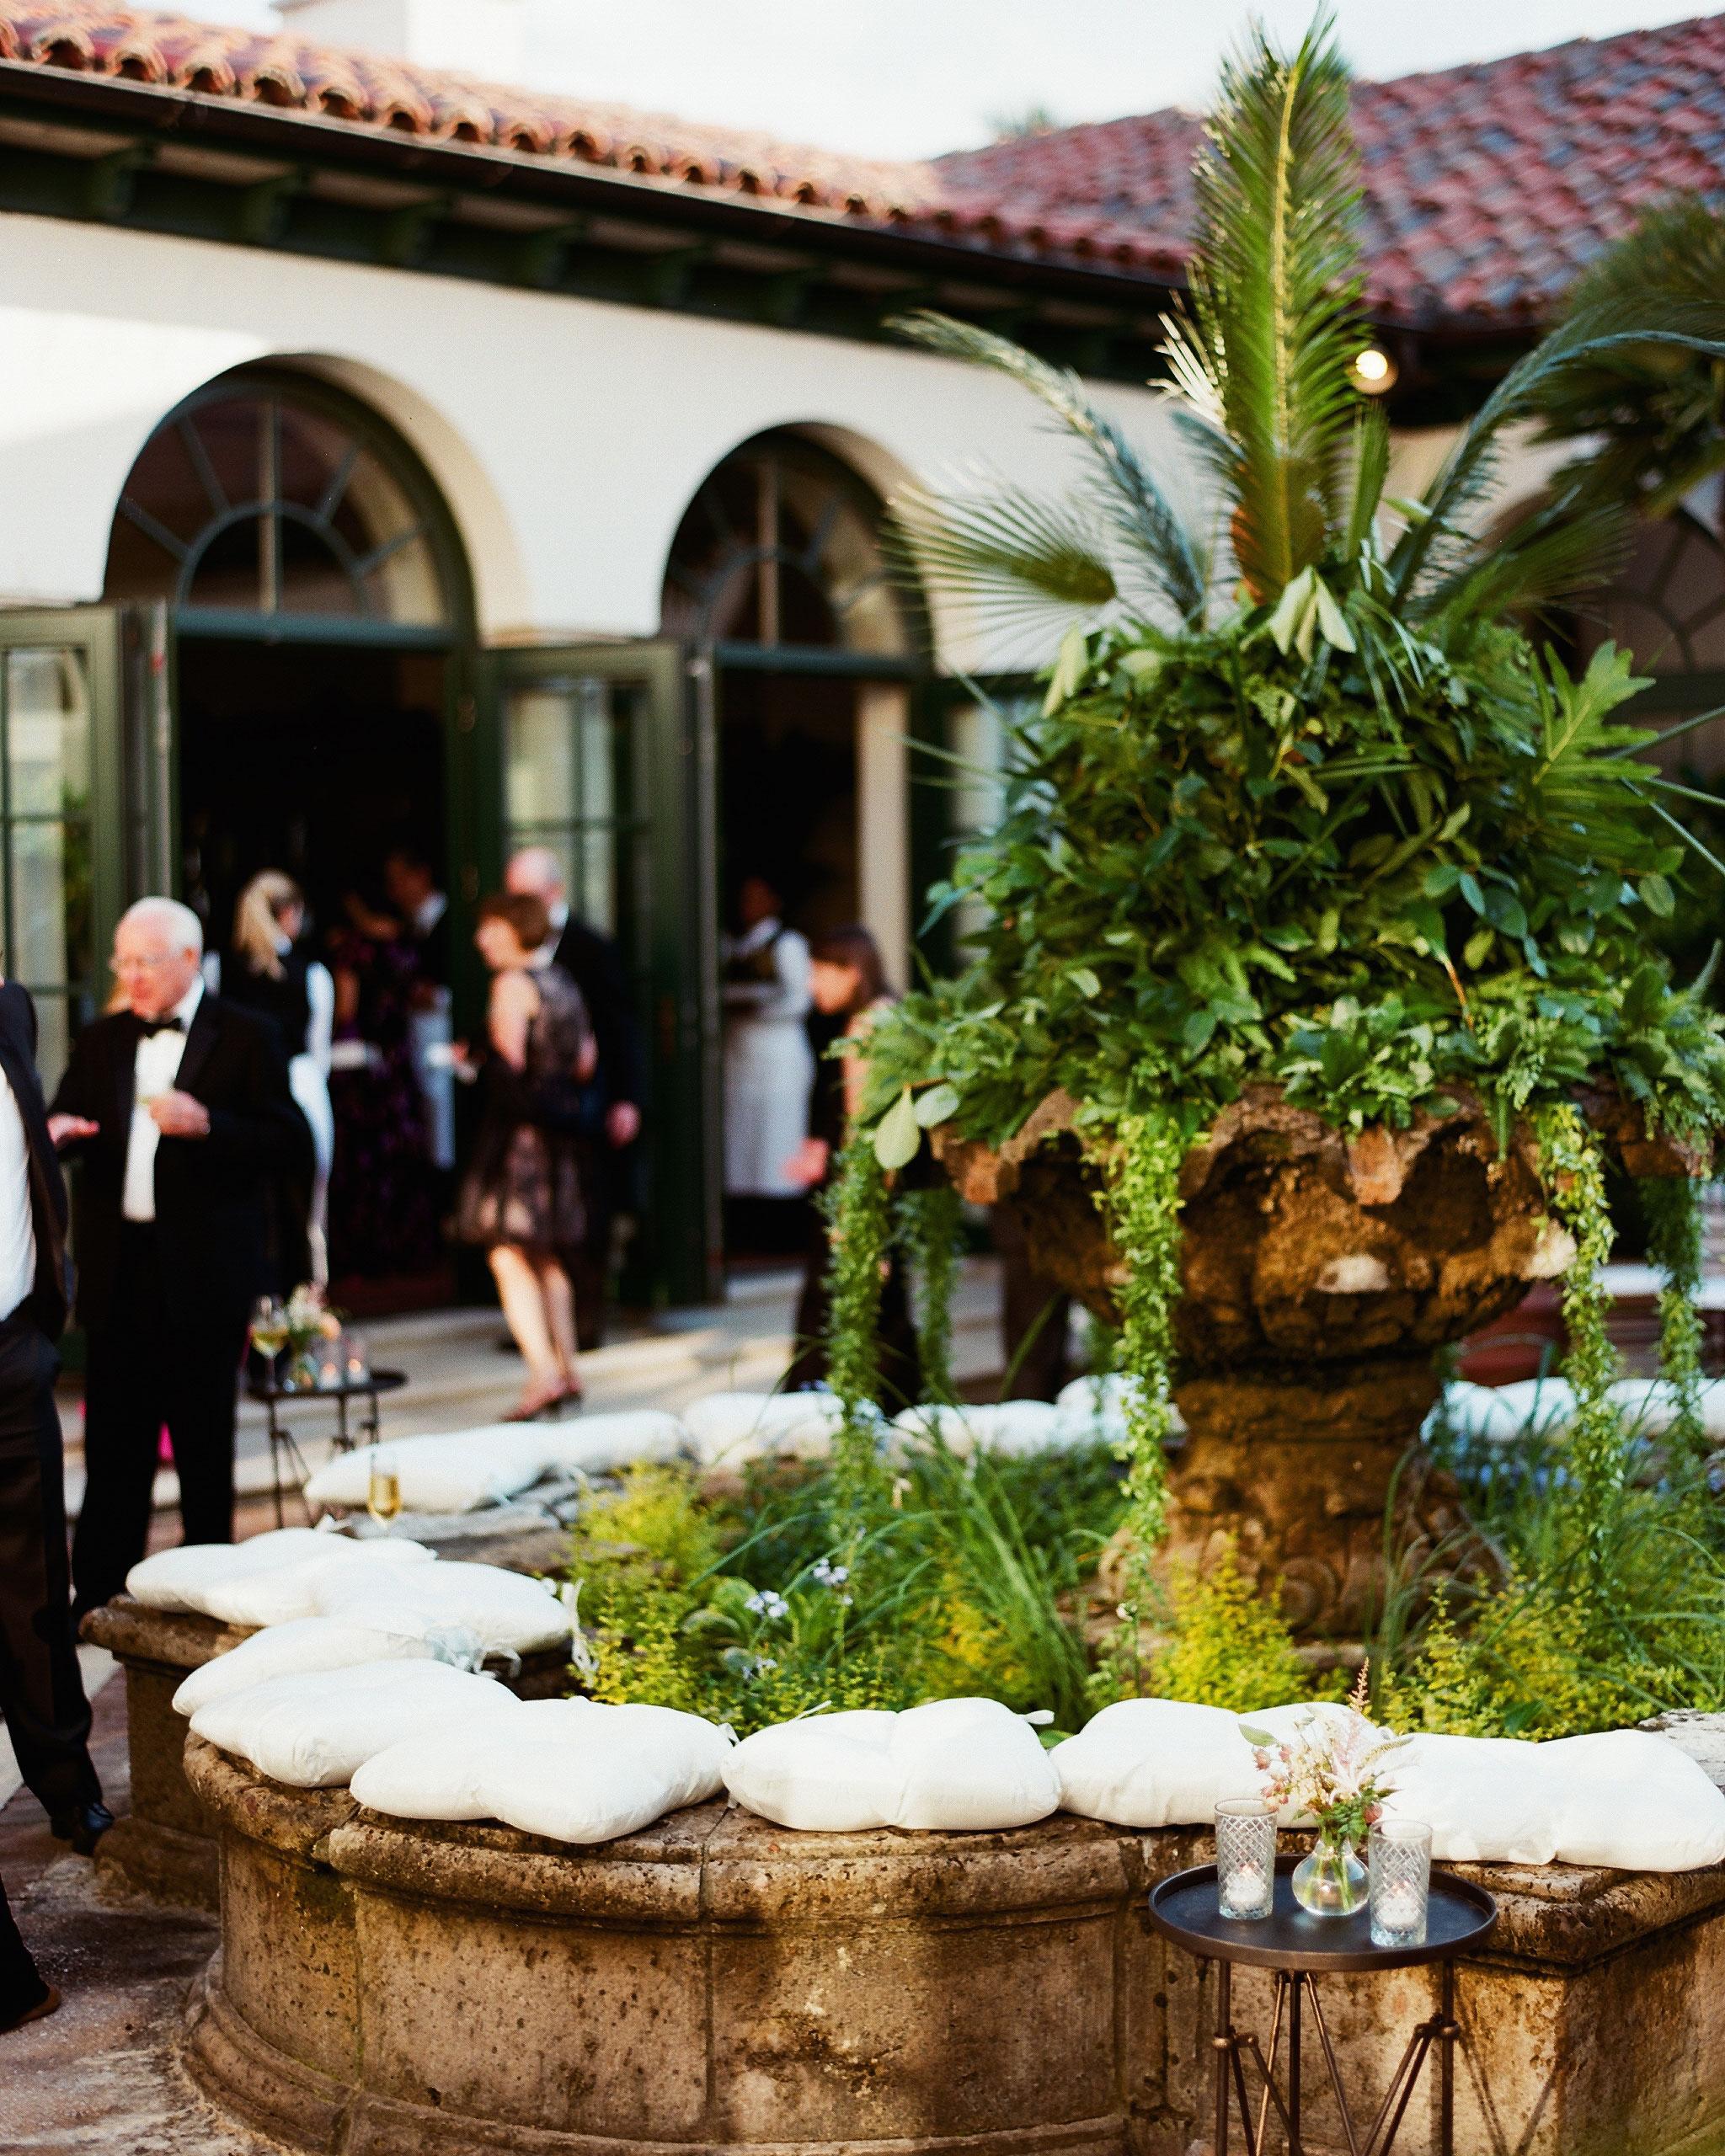 nancy-nathan-wedding-fountain-0870-6141569-0816.jpg